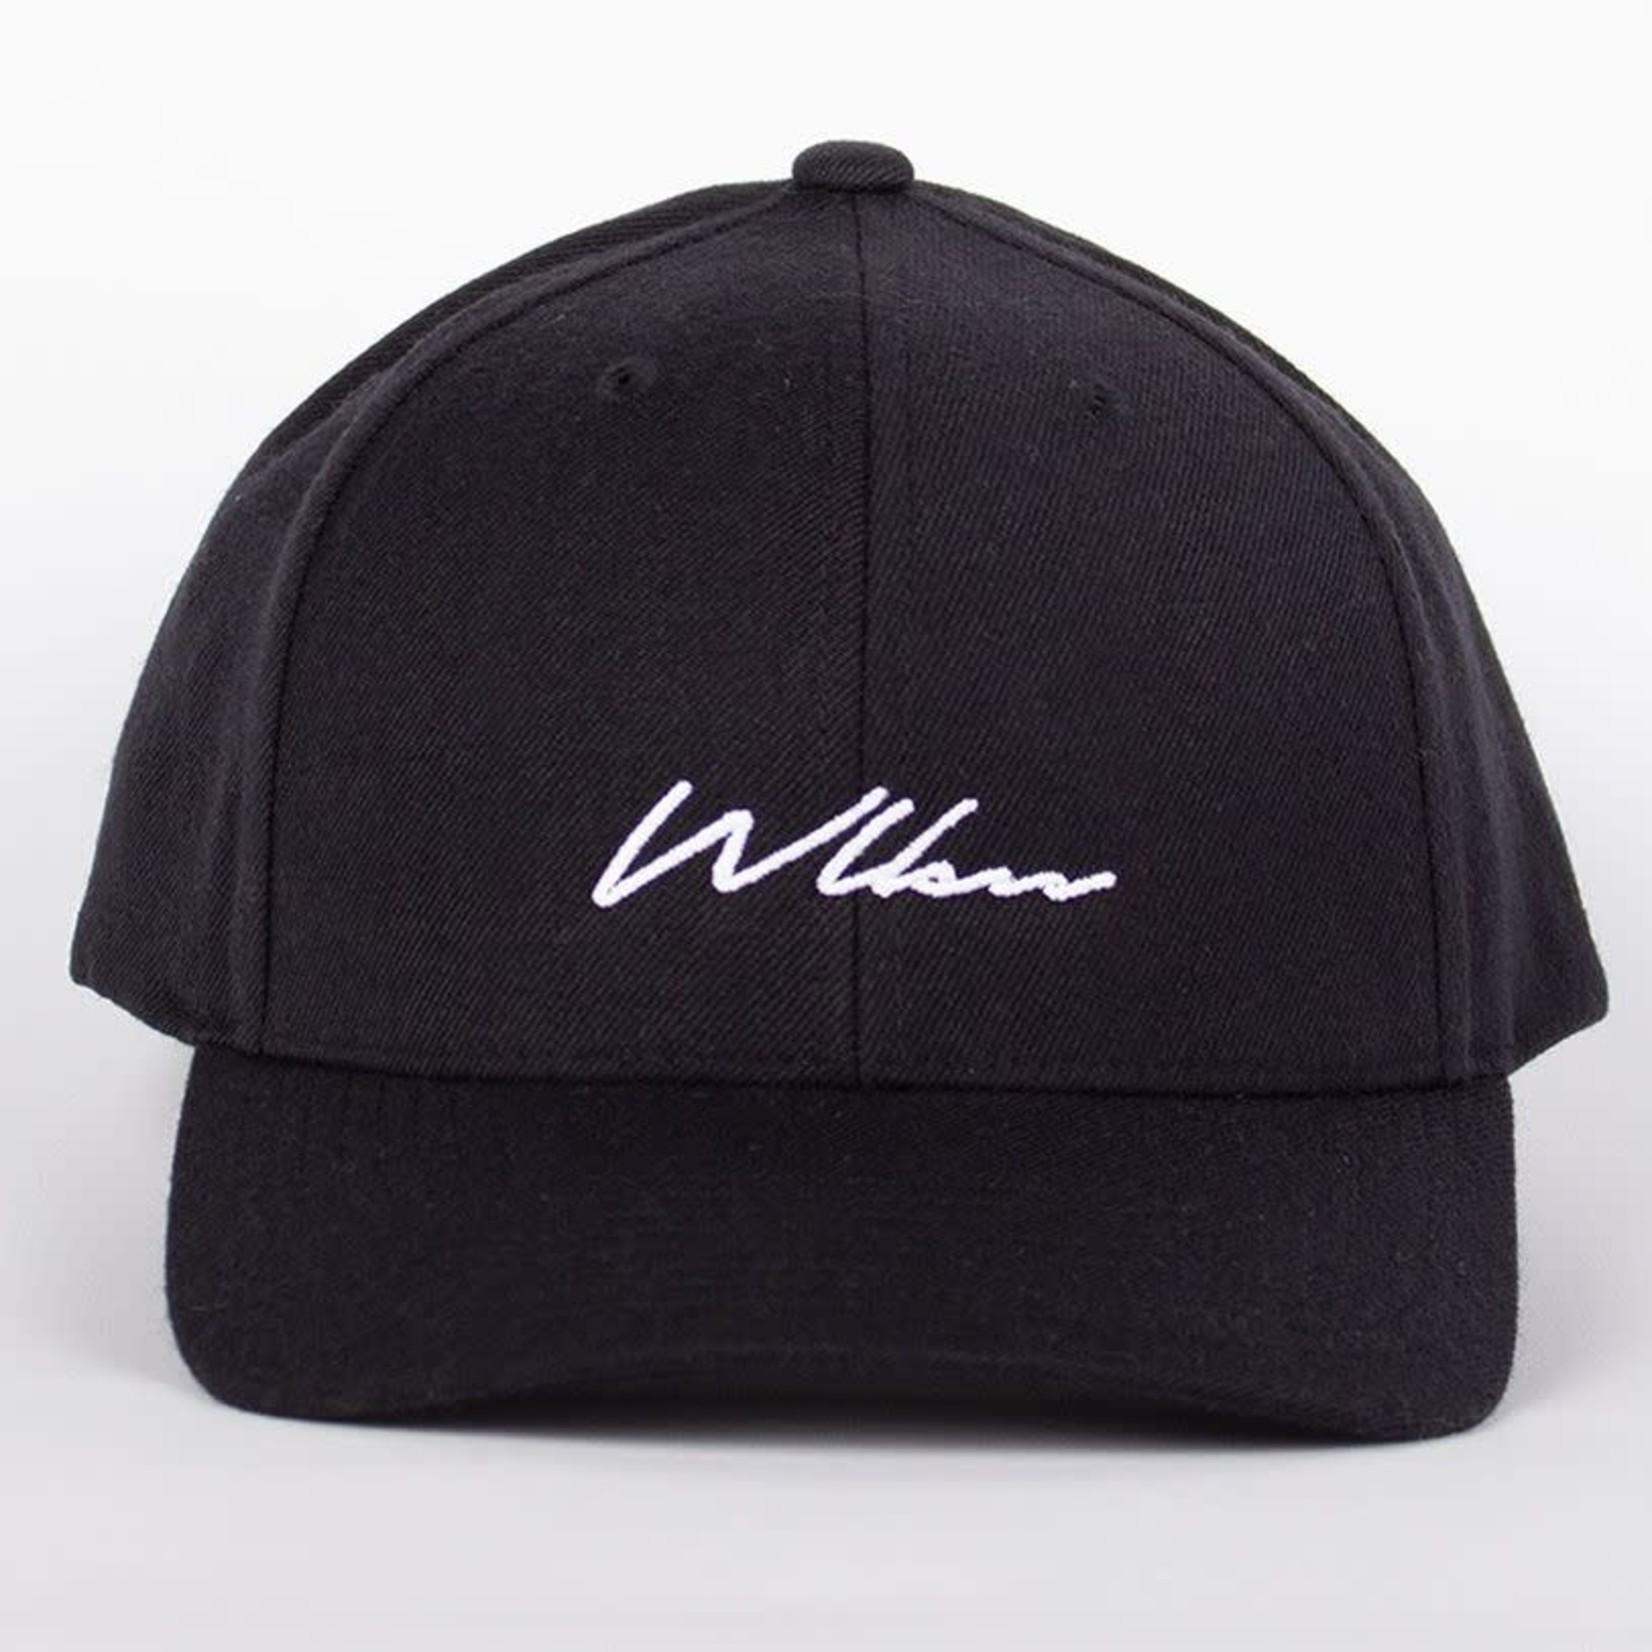 WLKN WLKN : Script Baseball Cap